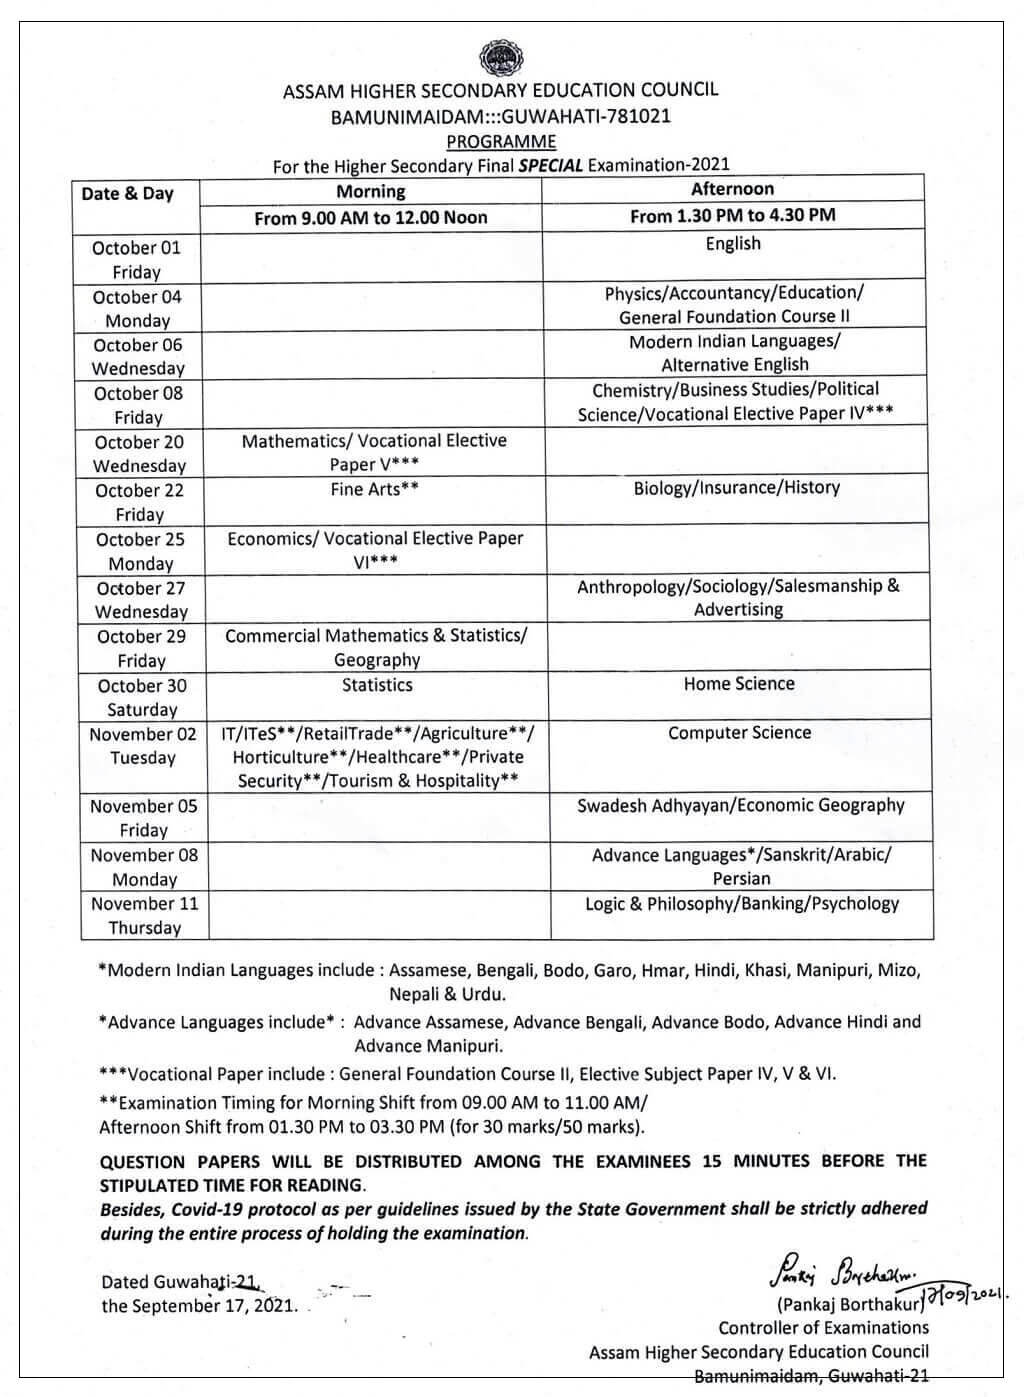 AHSEC-Special-Exam-Routine-2021